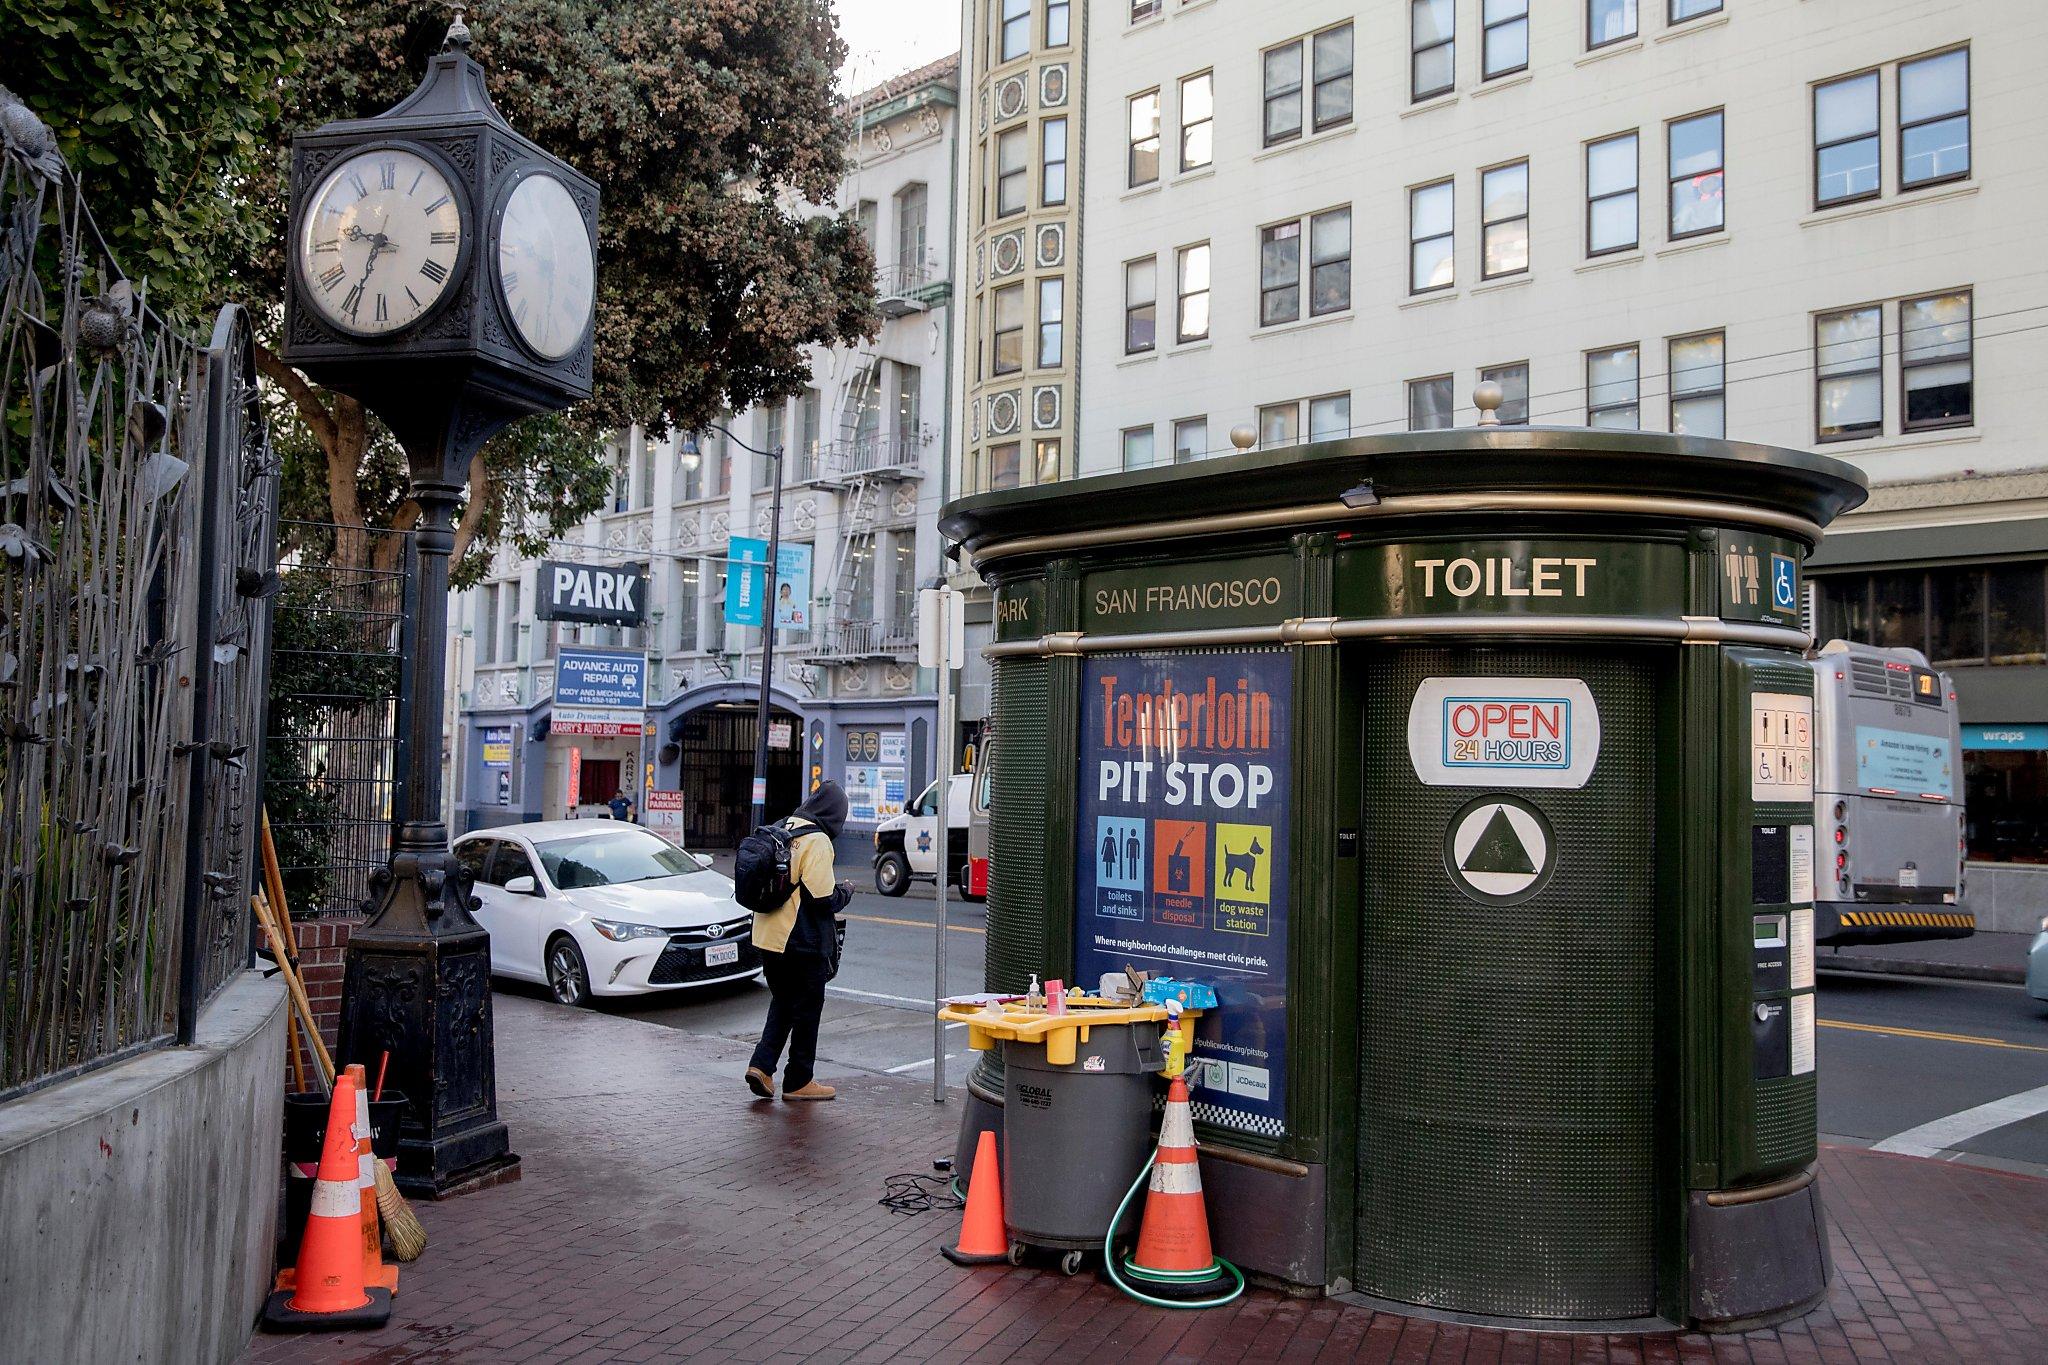 At $28.50 a flush, San Francisco leaders say public toilets worth it